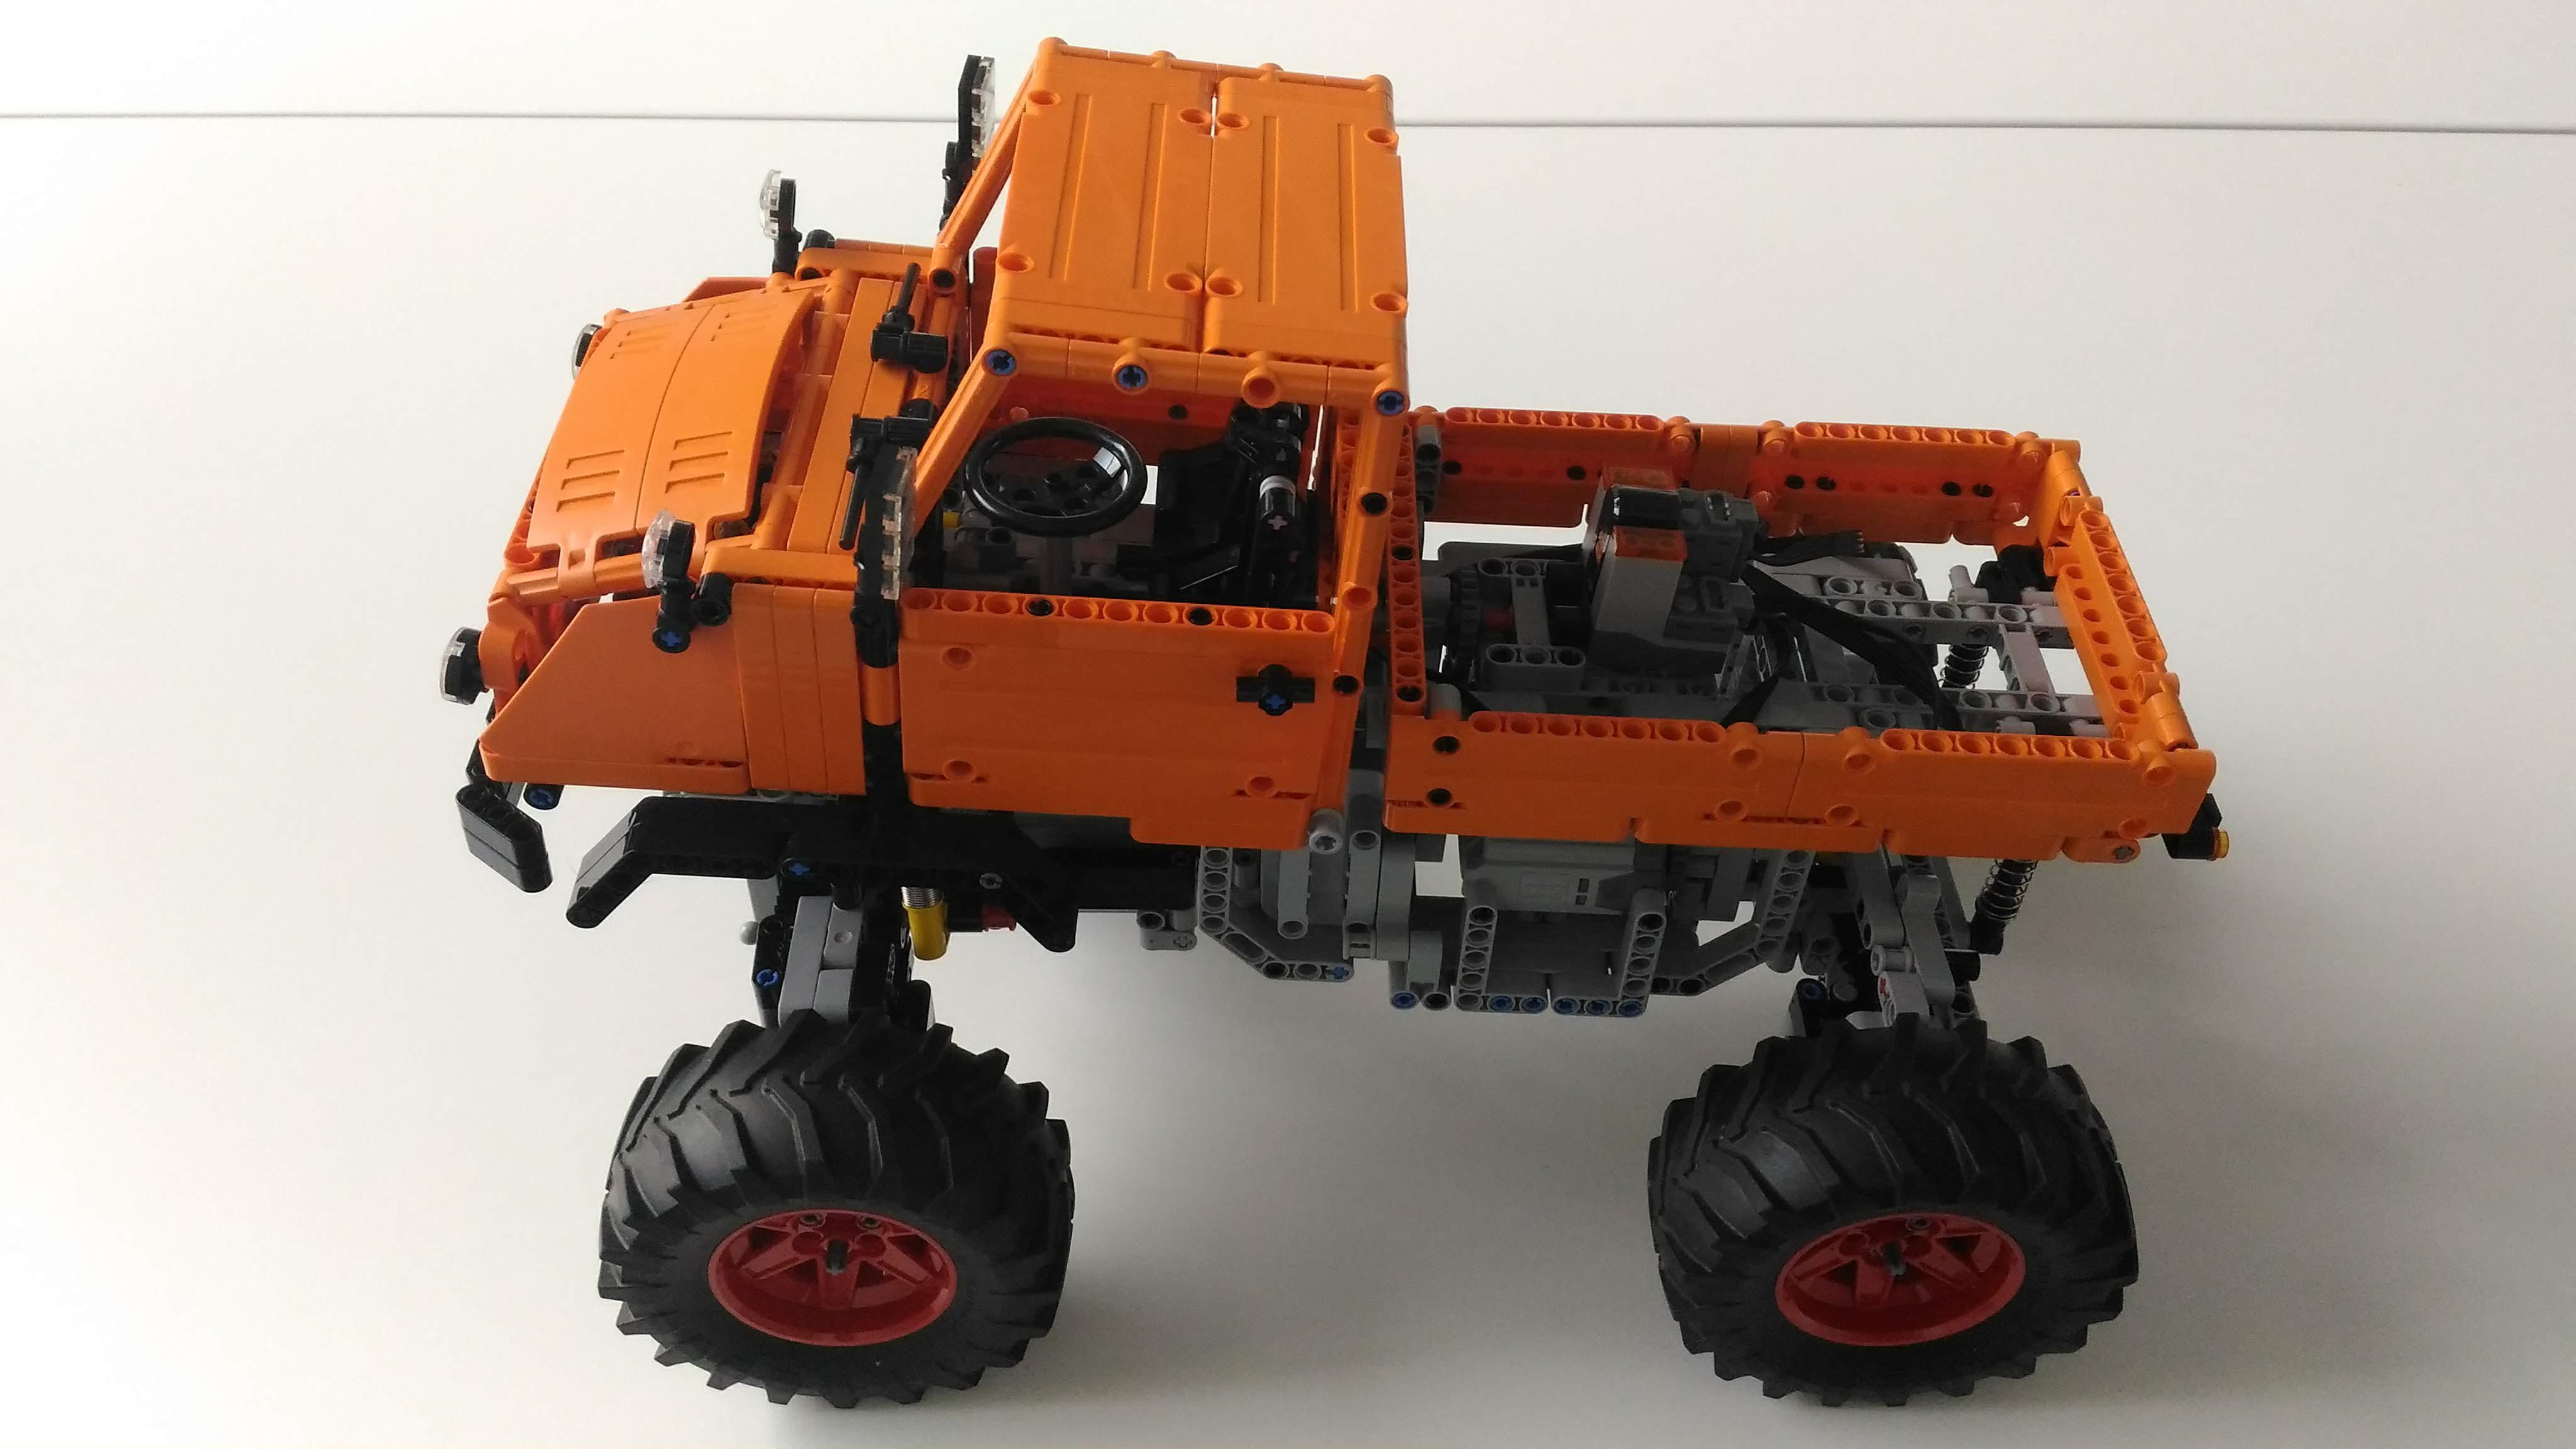 Unimog 406 by braker23